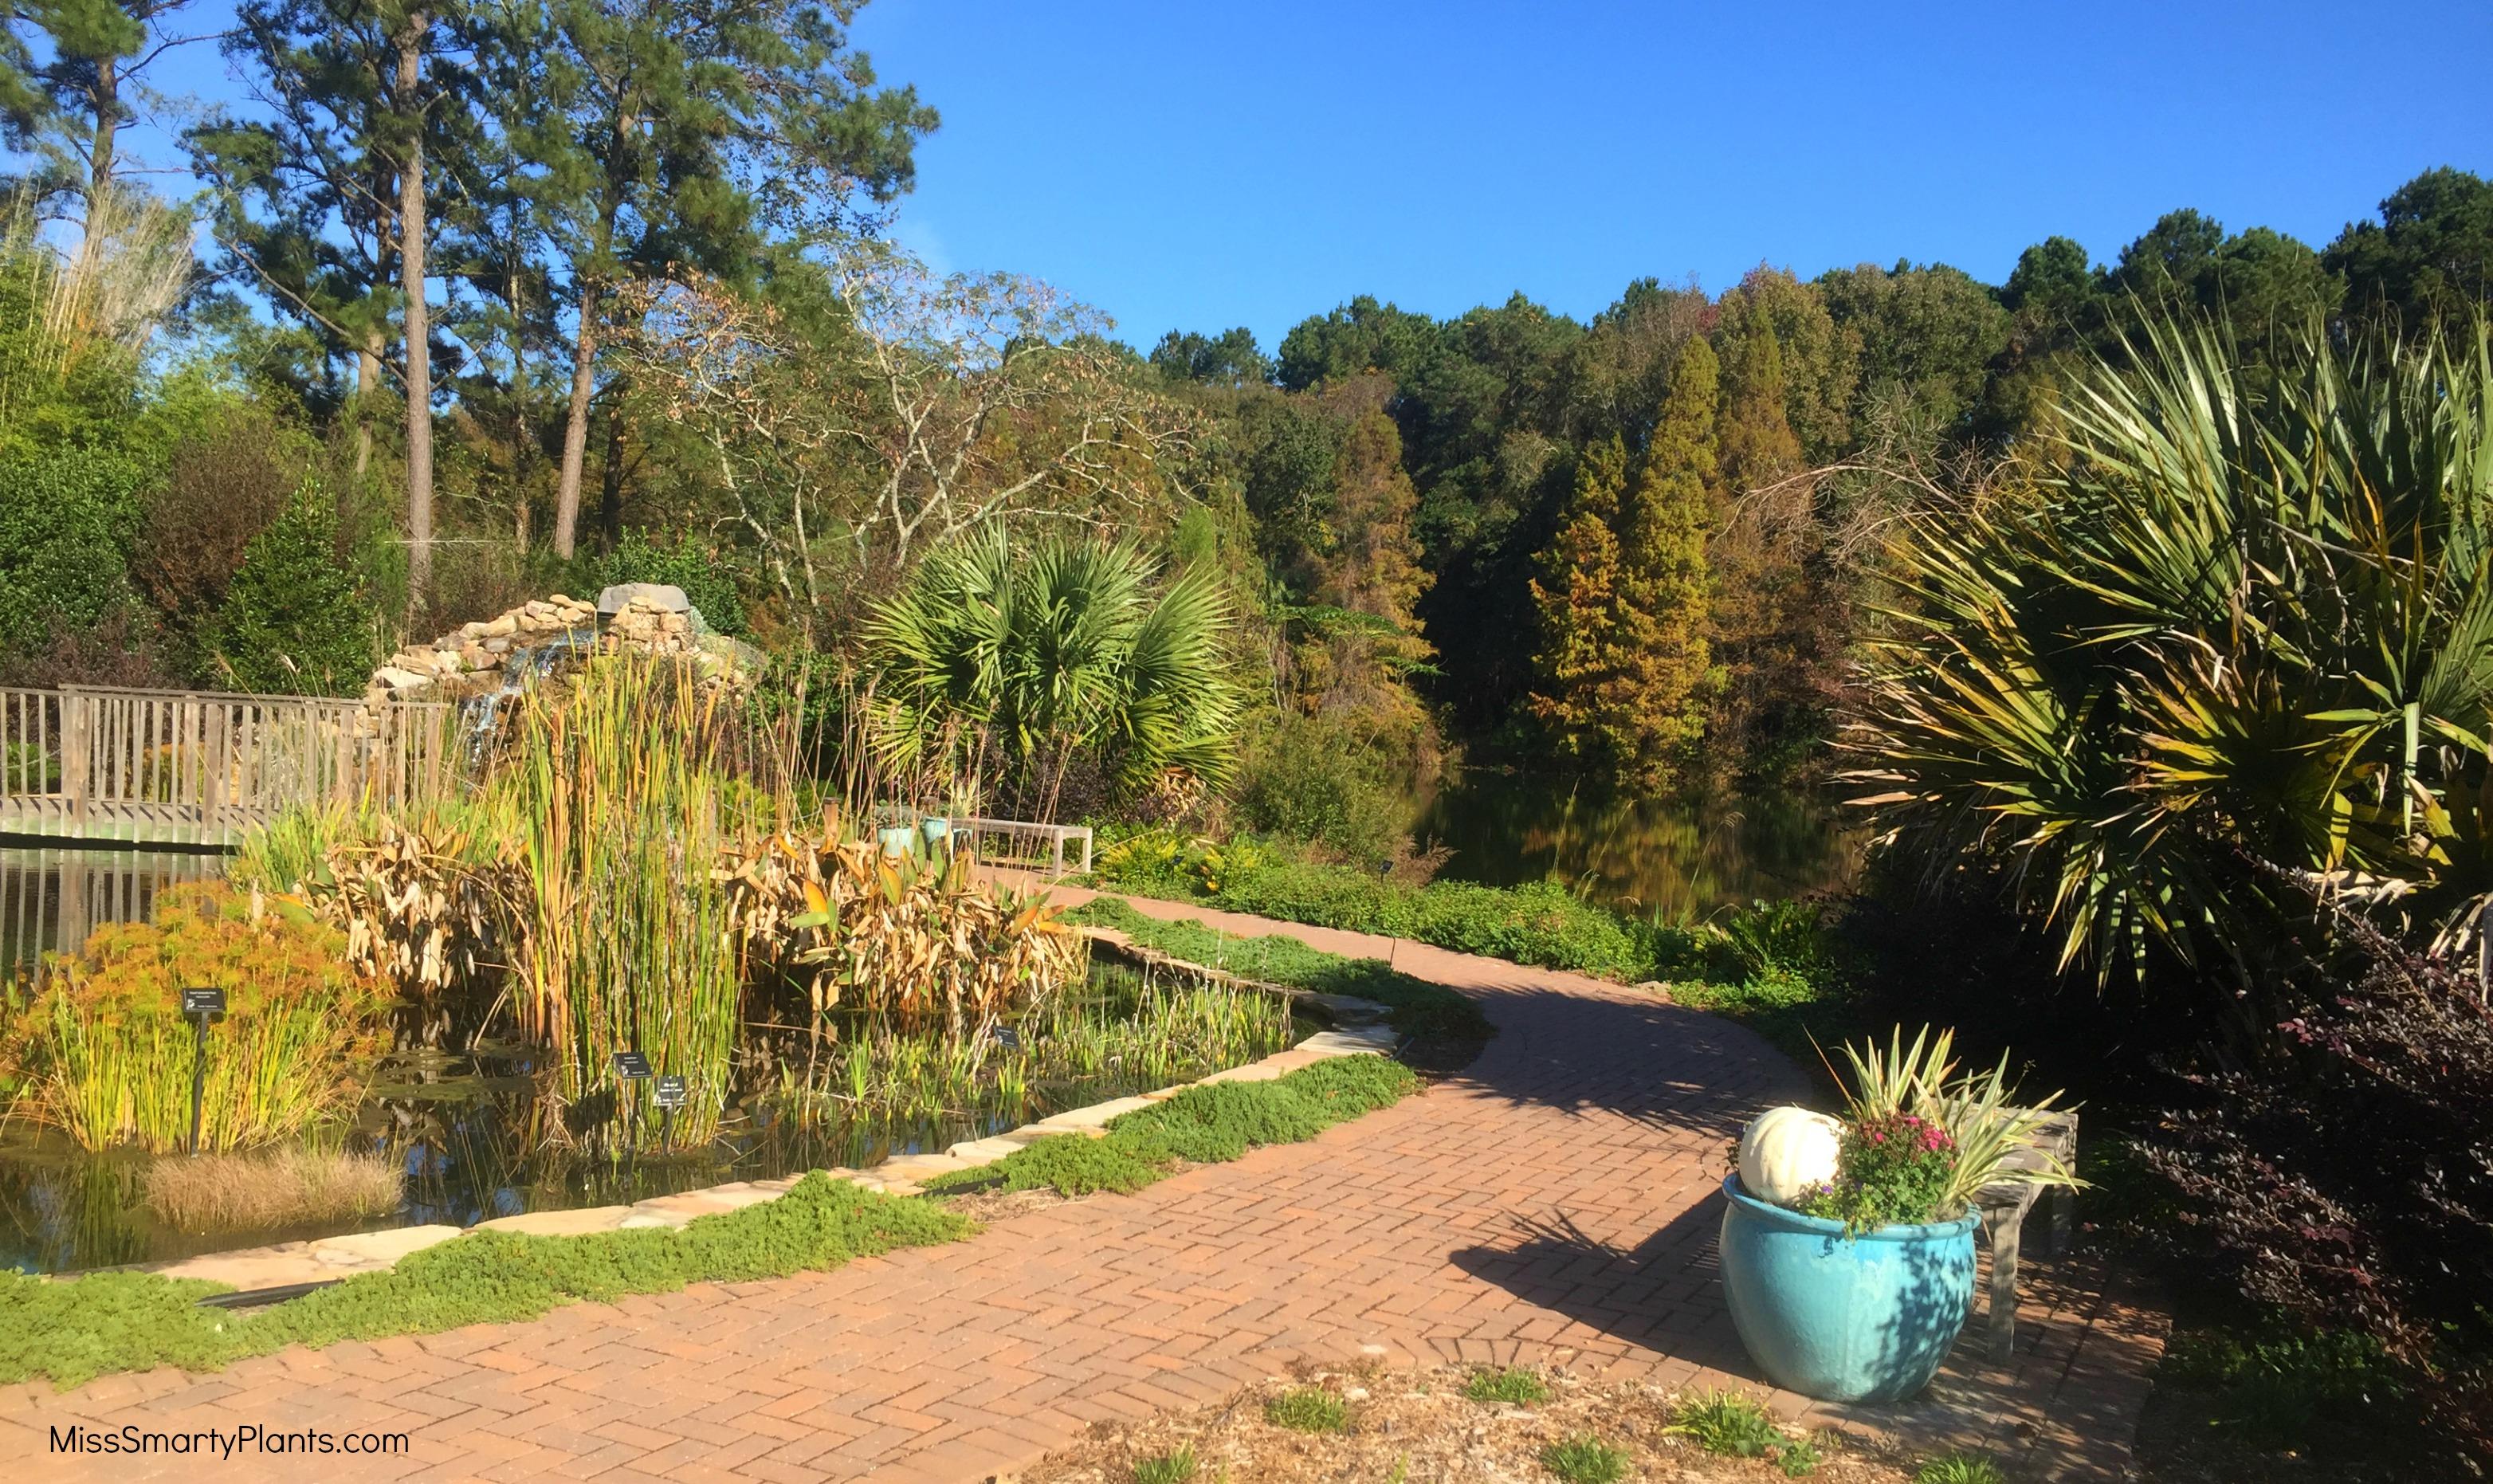 Visiting Coastal Georgia Botanical Gardens